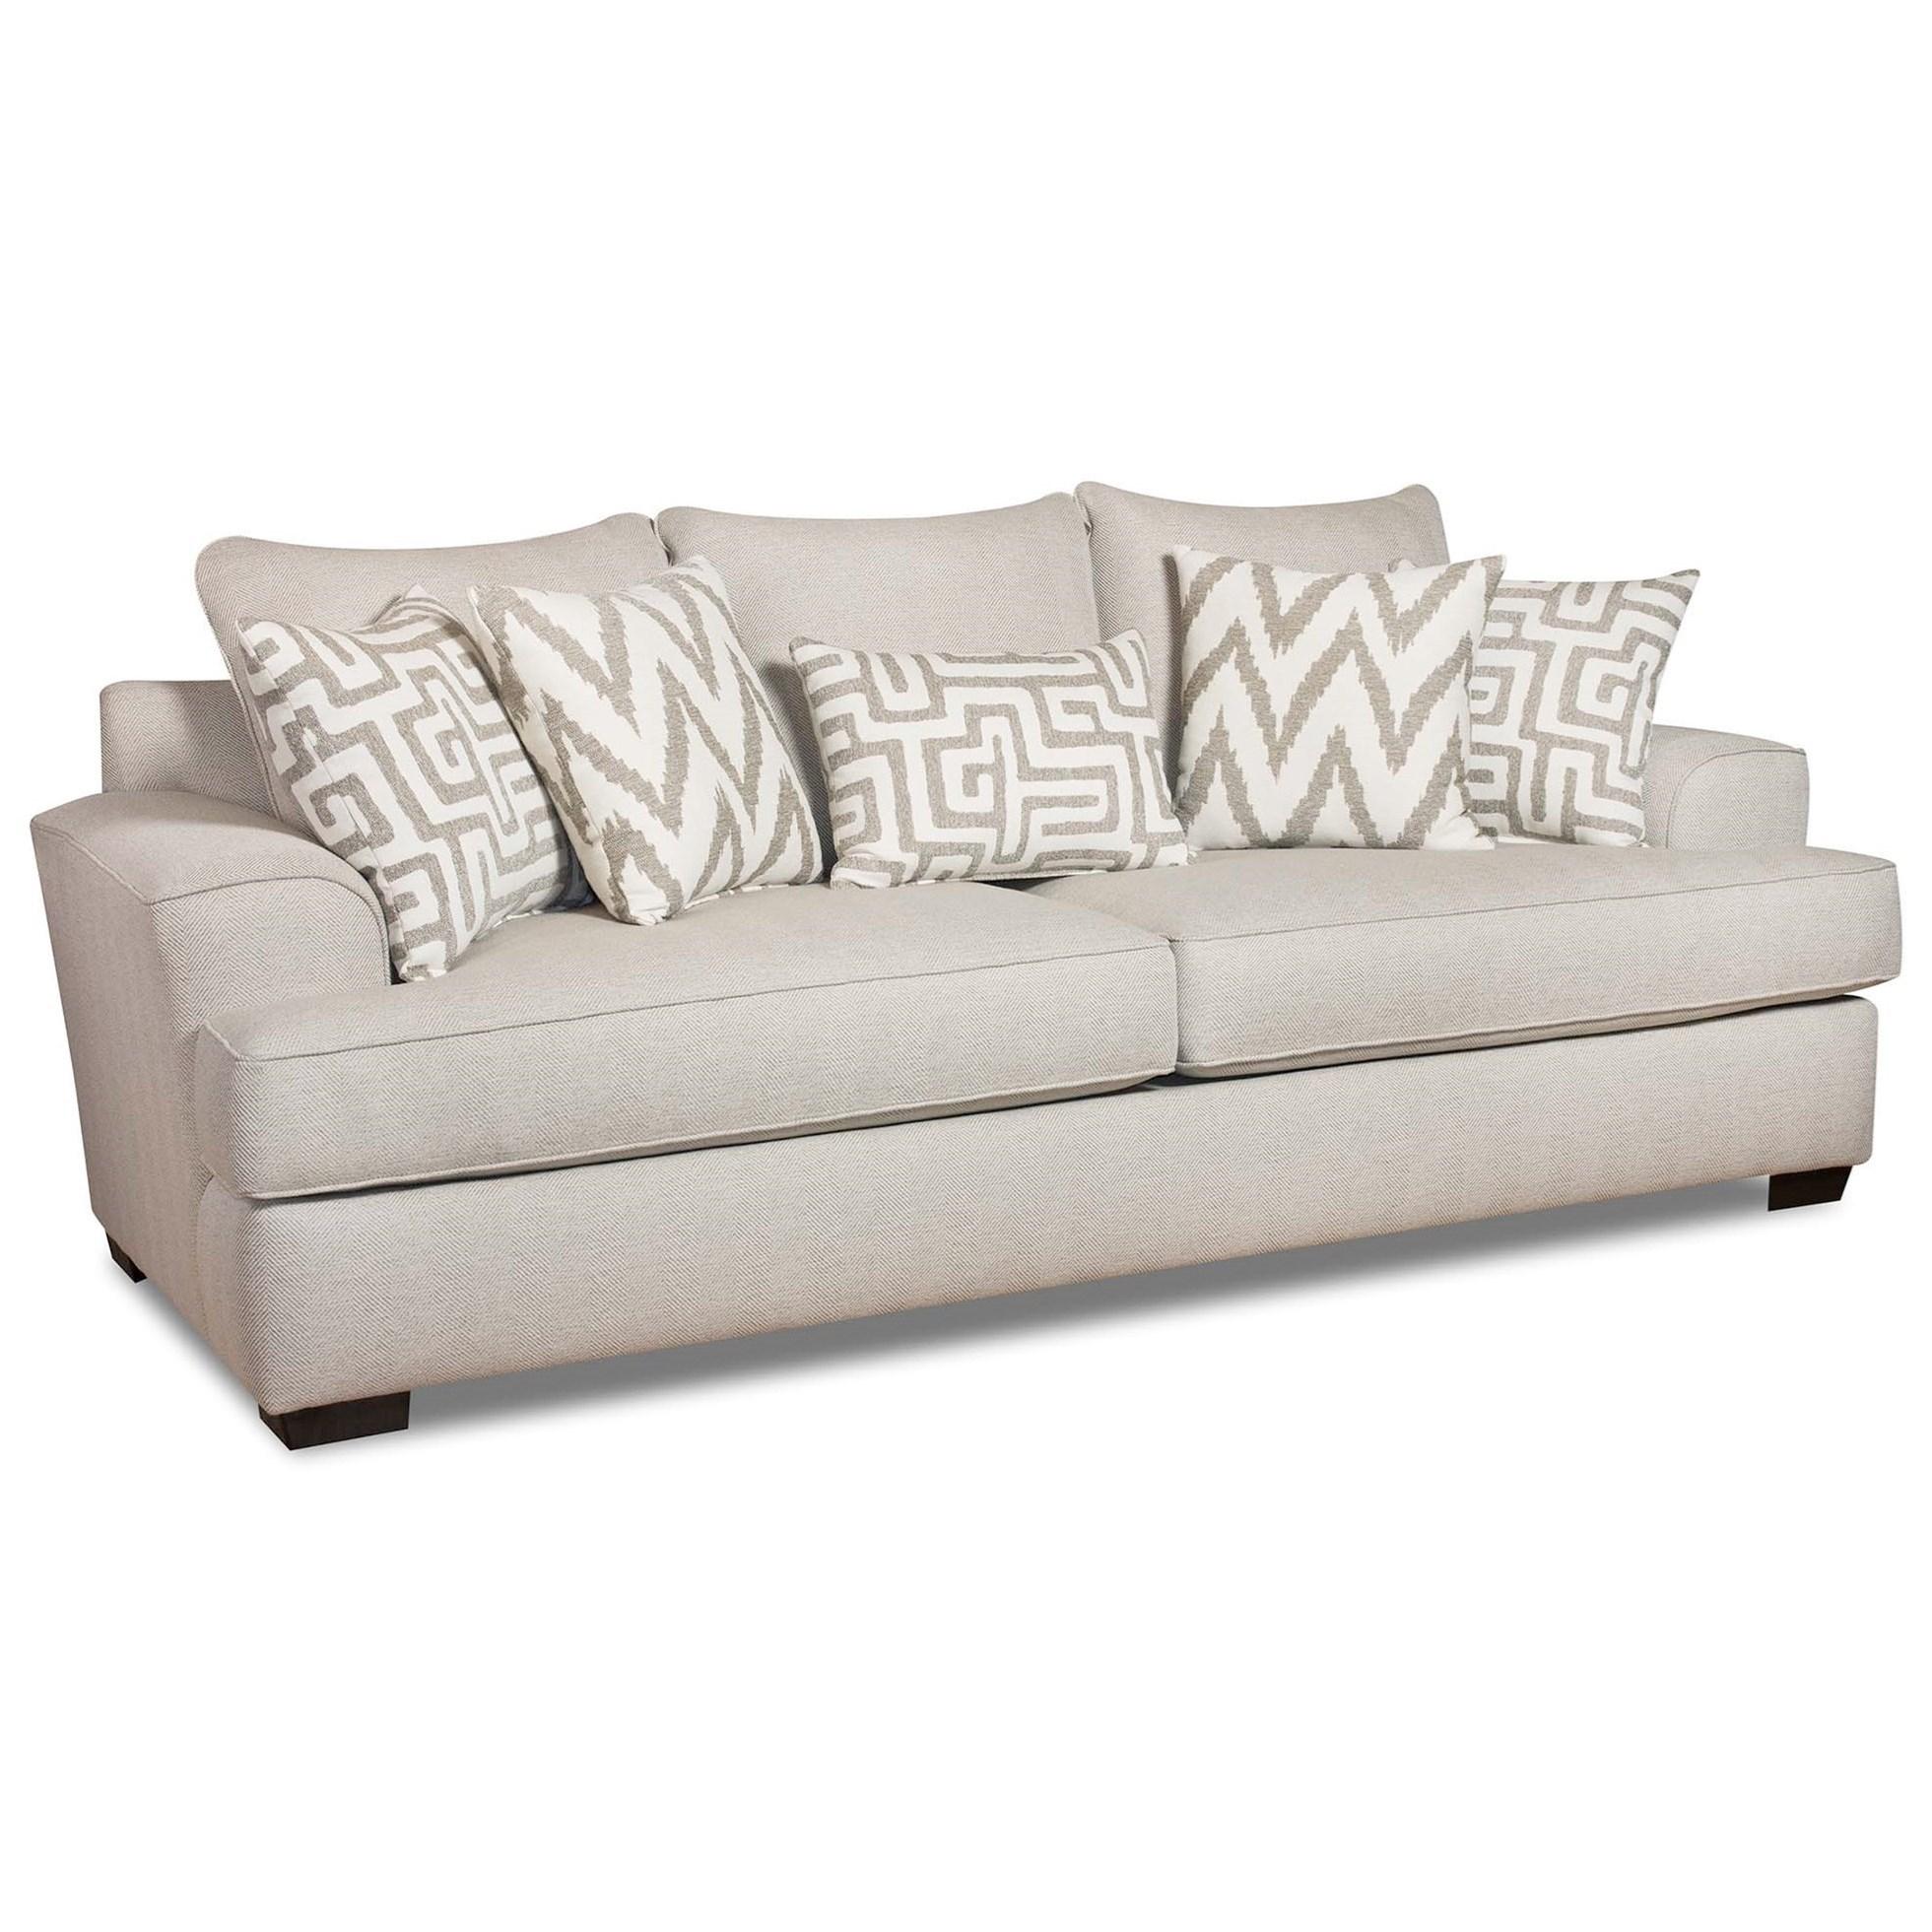 oatmeal sofa red floral corinthian 32b0 32b3 furniture fair north carolina sofas